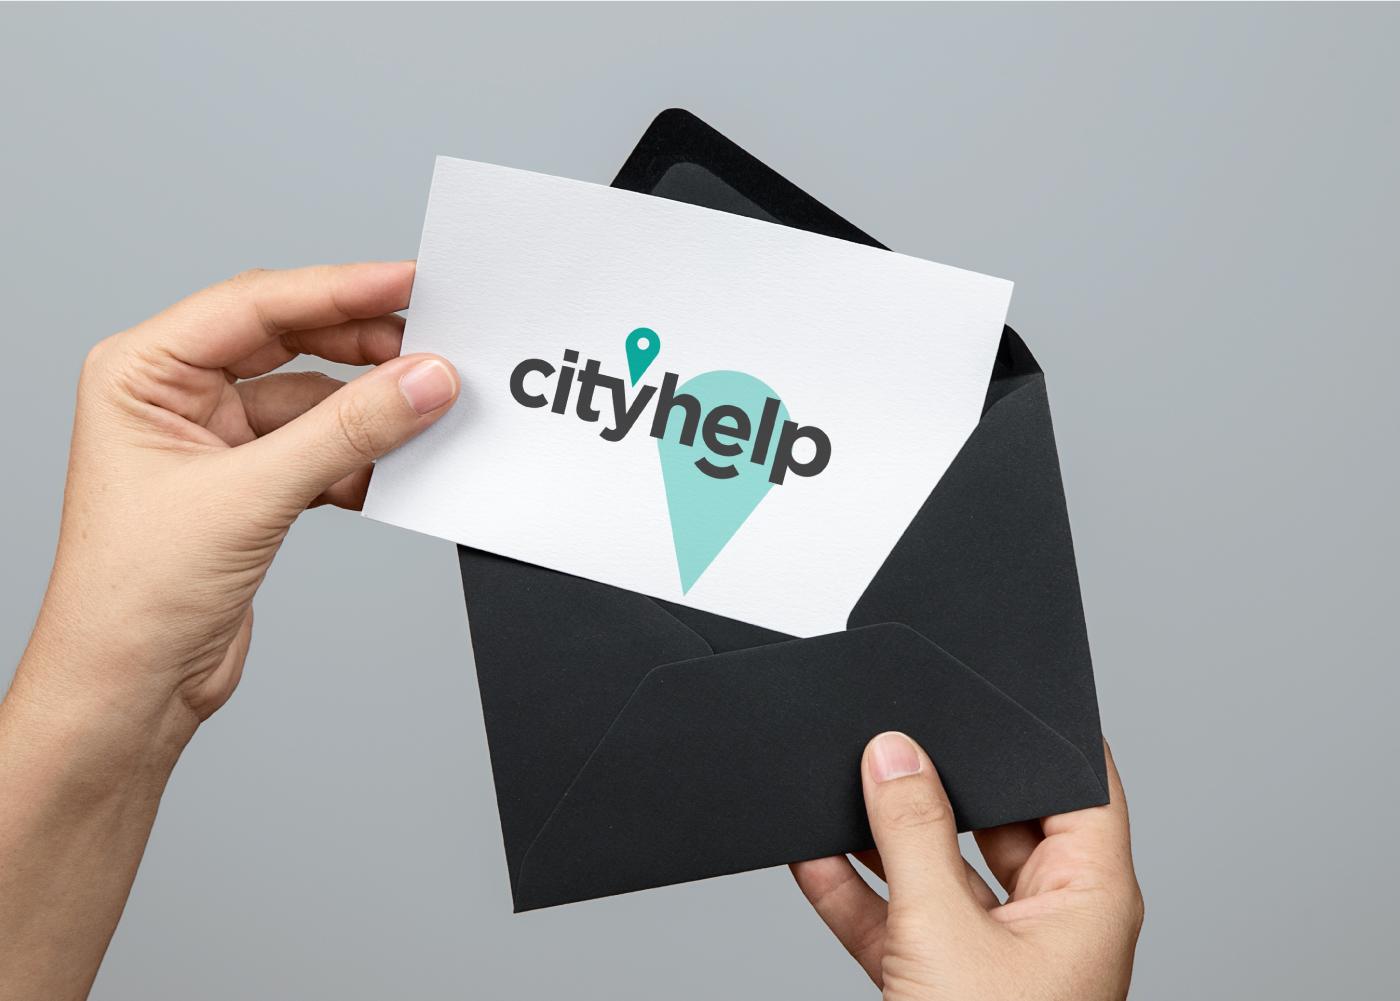 cityhelp-marca-logotipo-tarjeton